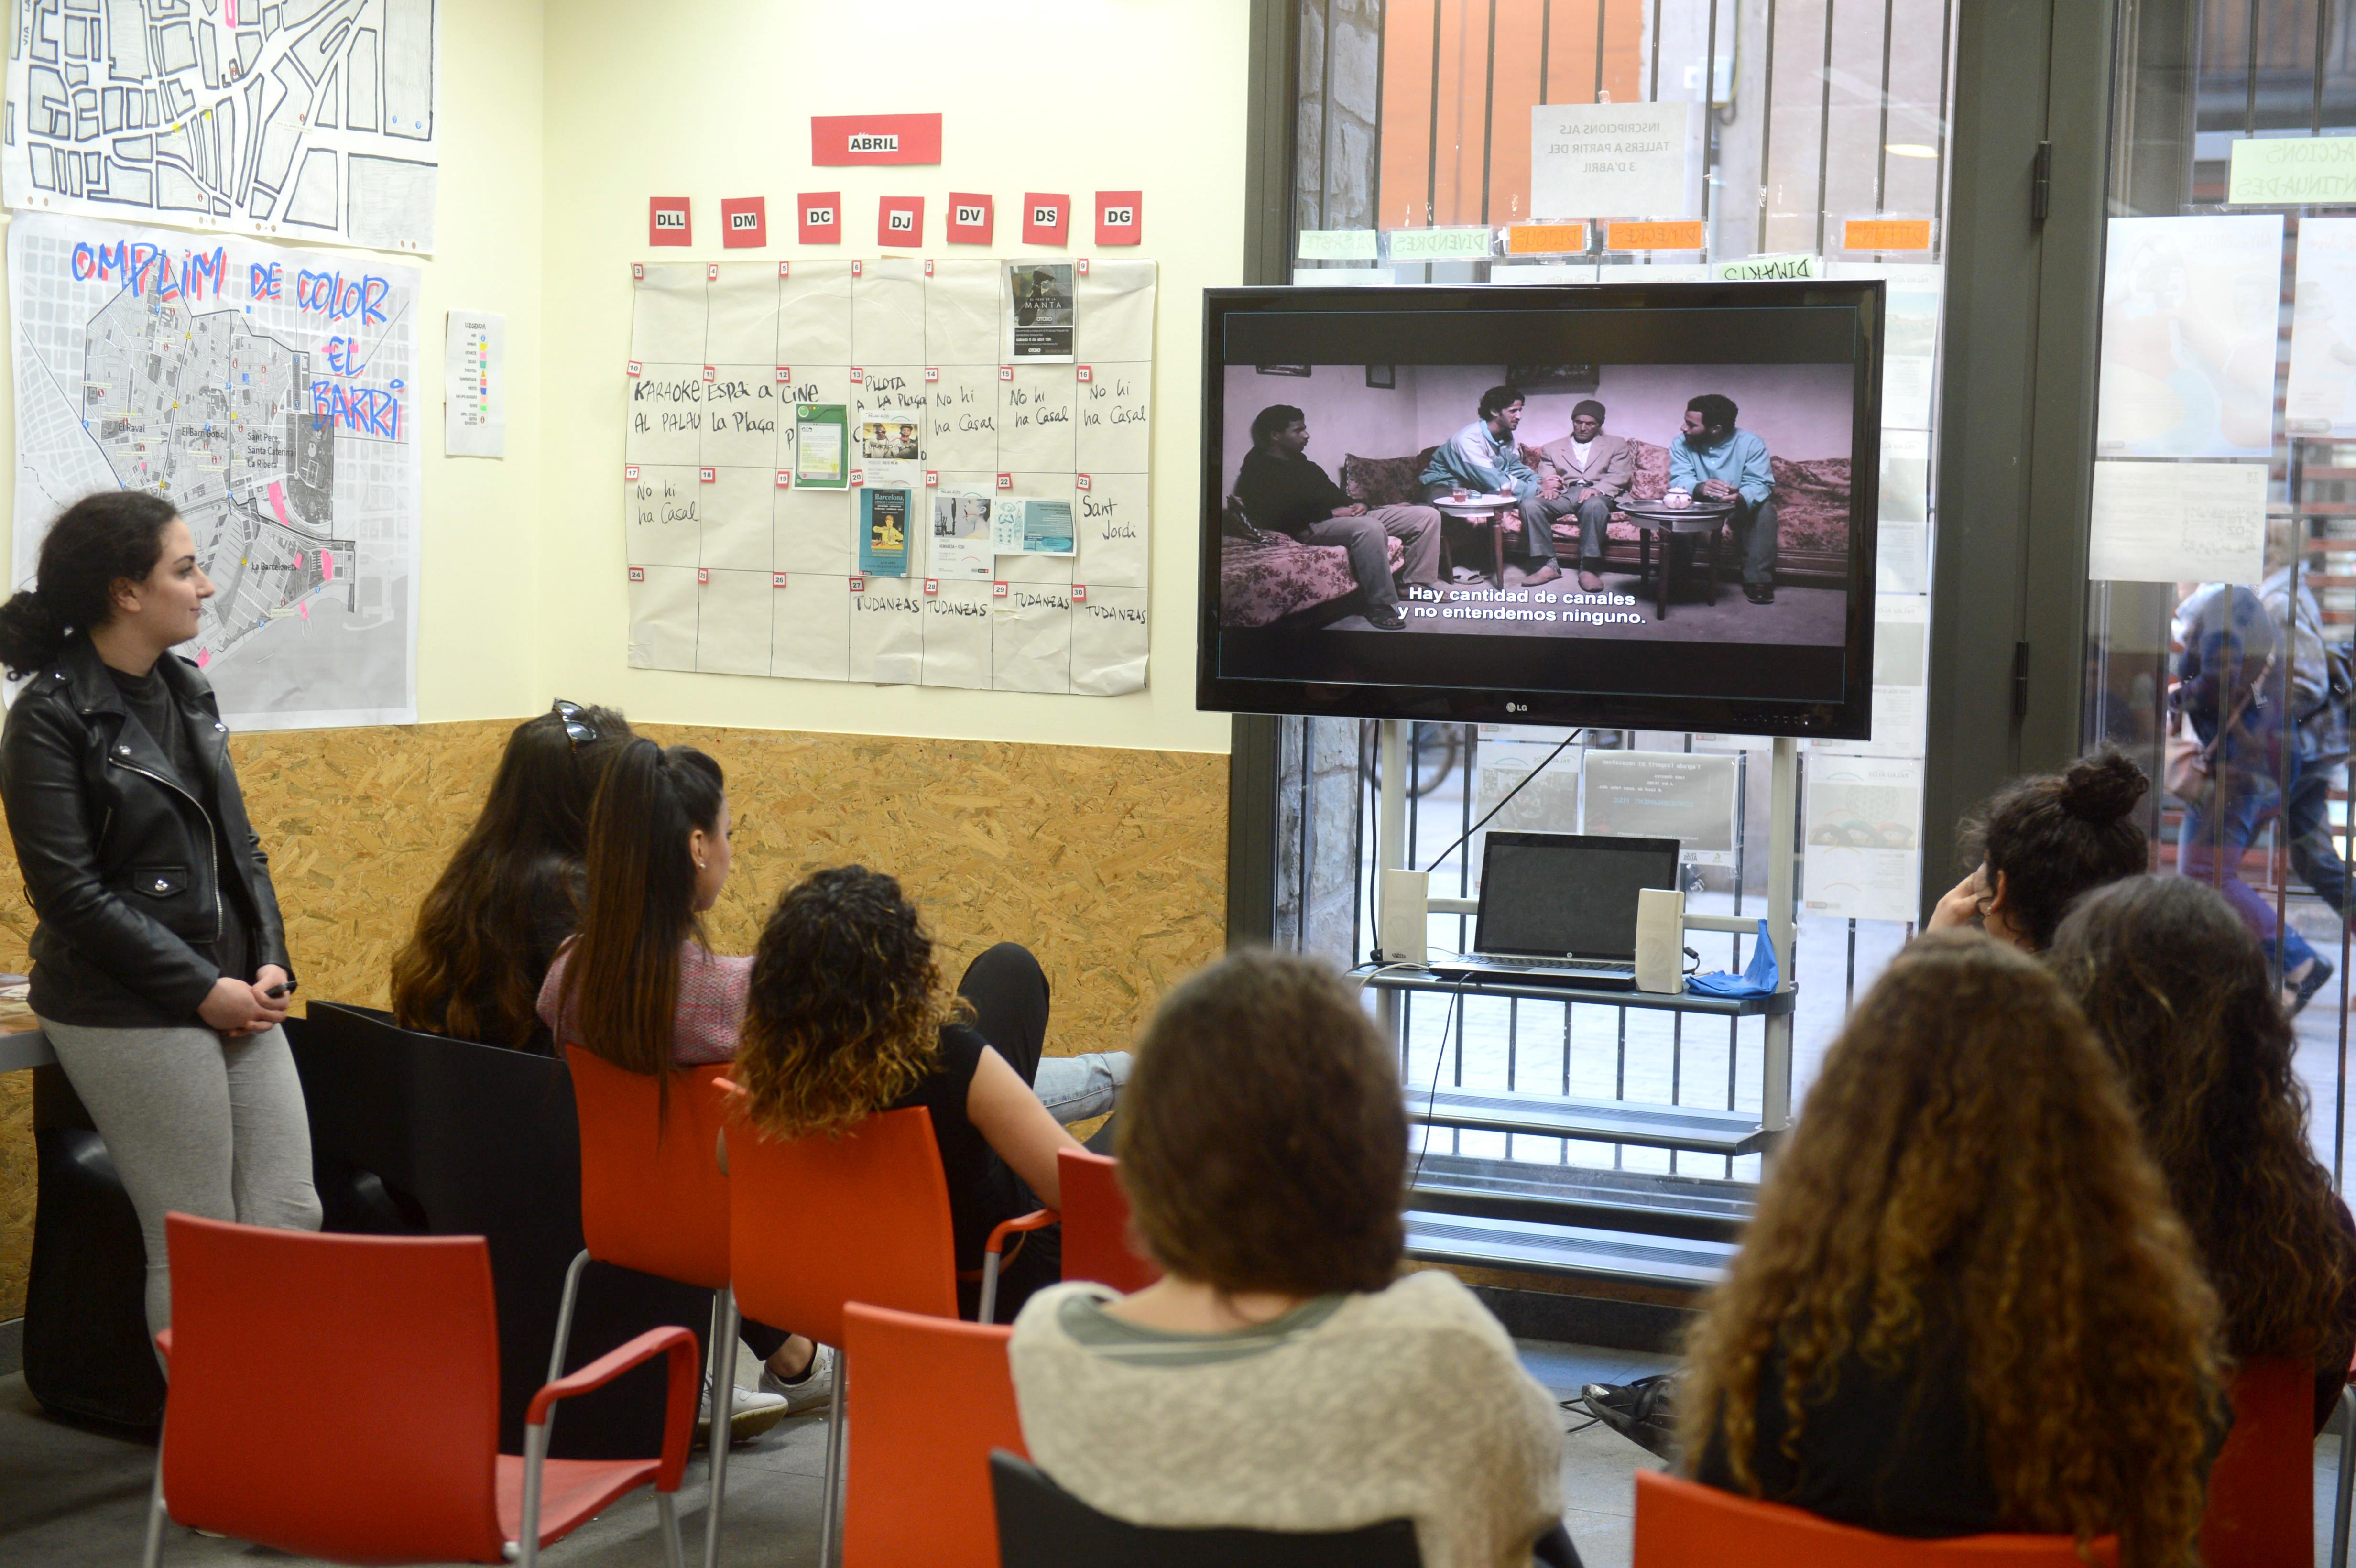 Espacio joven Palau Alòs Audiovisuales